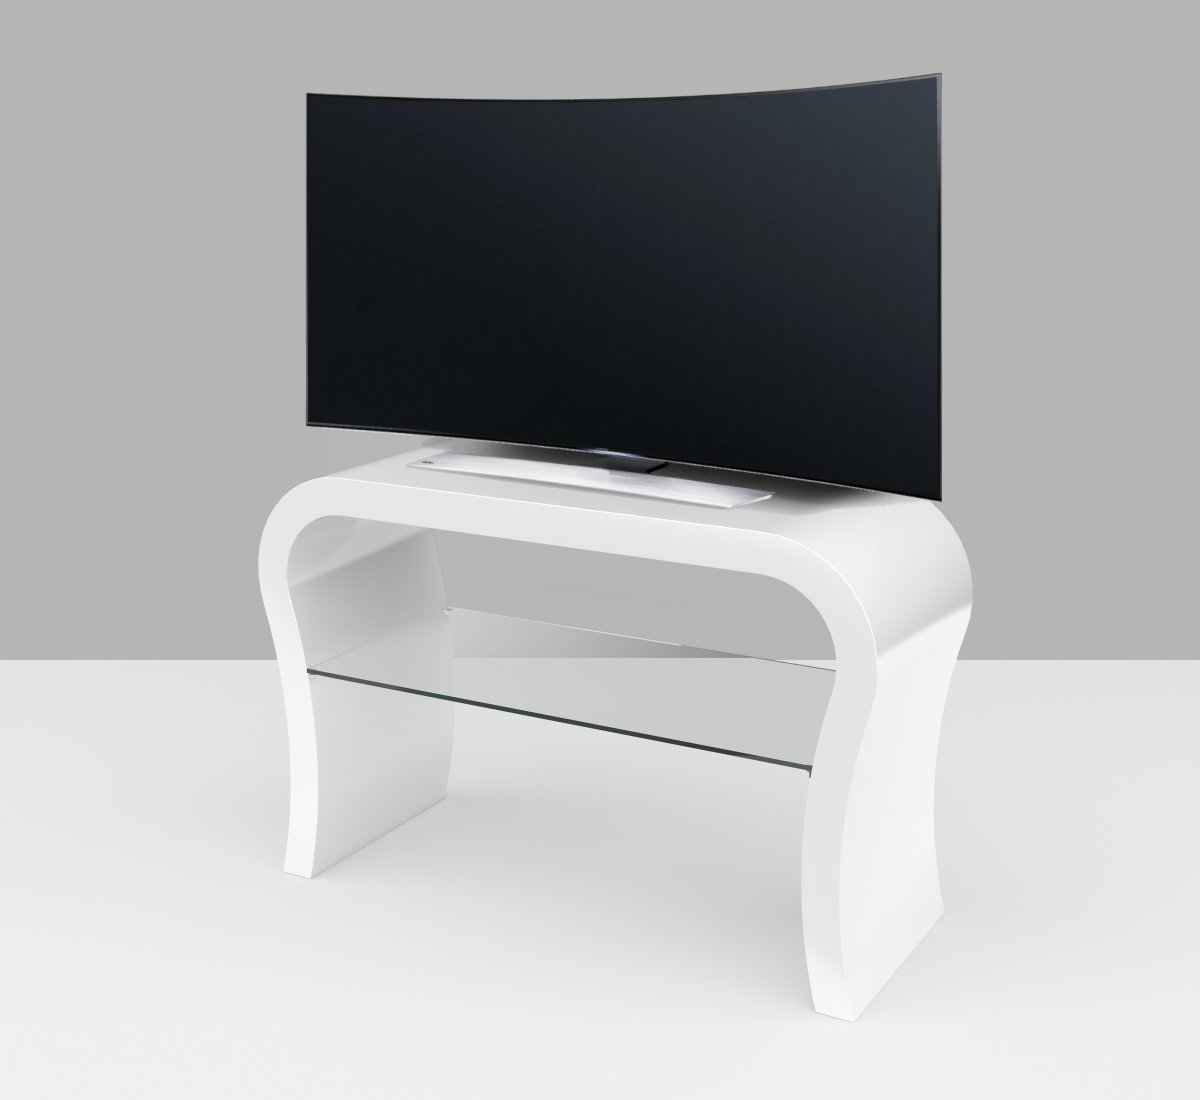 Custom Made Media Units – Zespoke Pertaining To White Gloss Tv Benches (View 5 of 20)